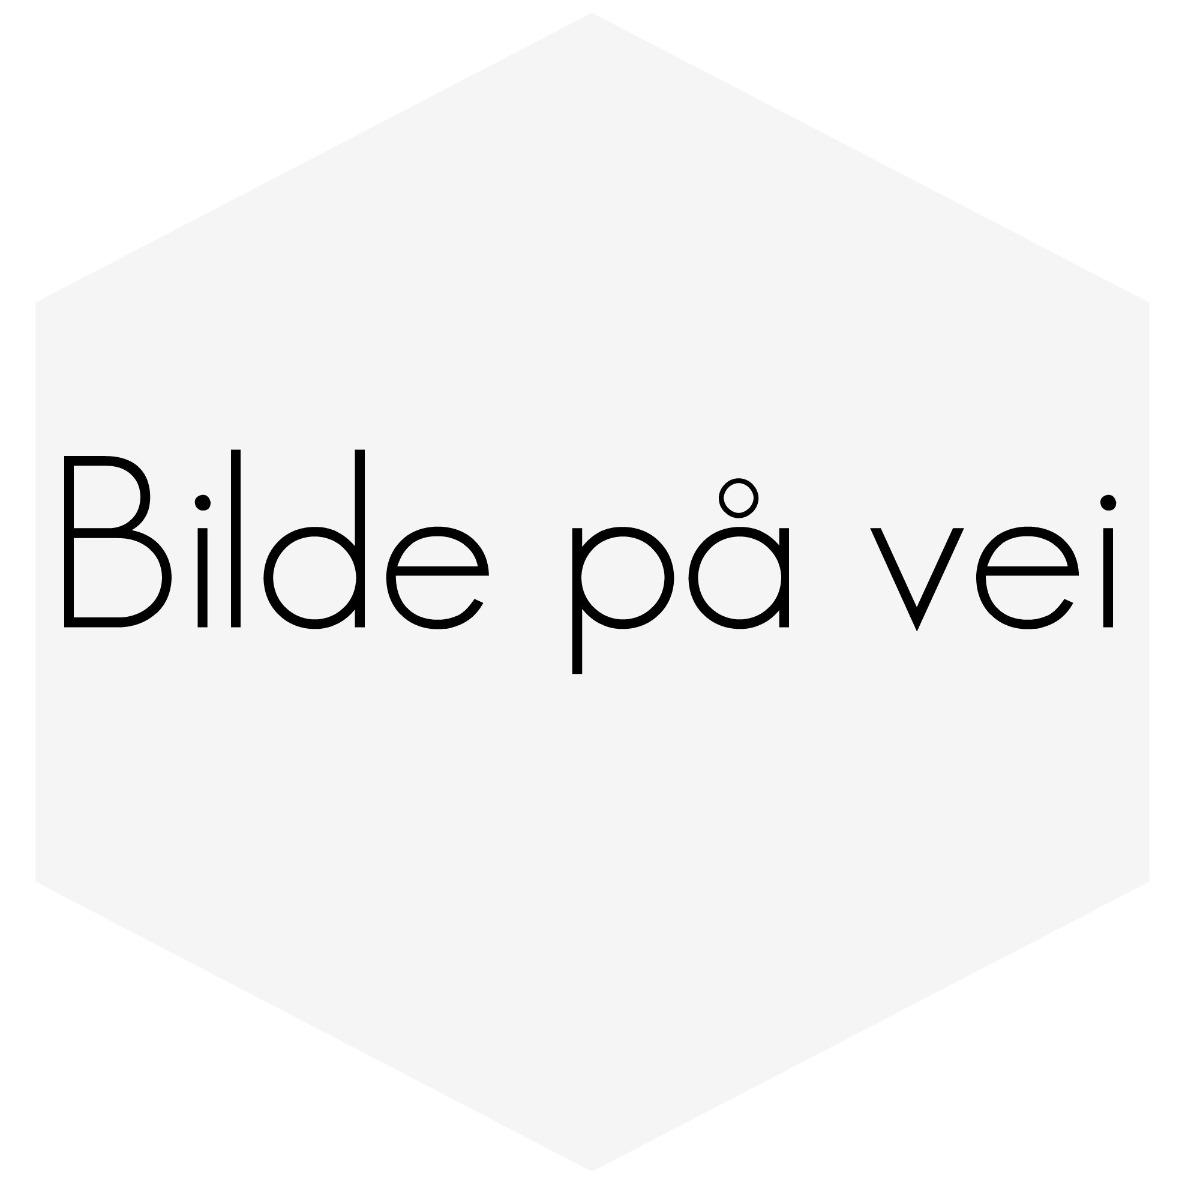 SKVETTLAPP SATS BAK TIL VOLVO XC60 SE INFO